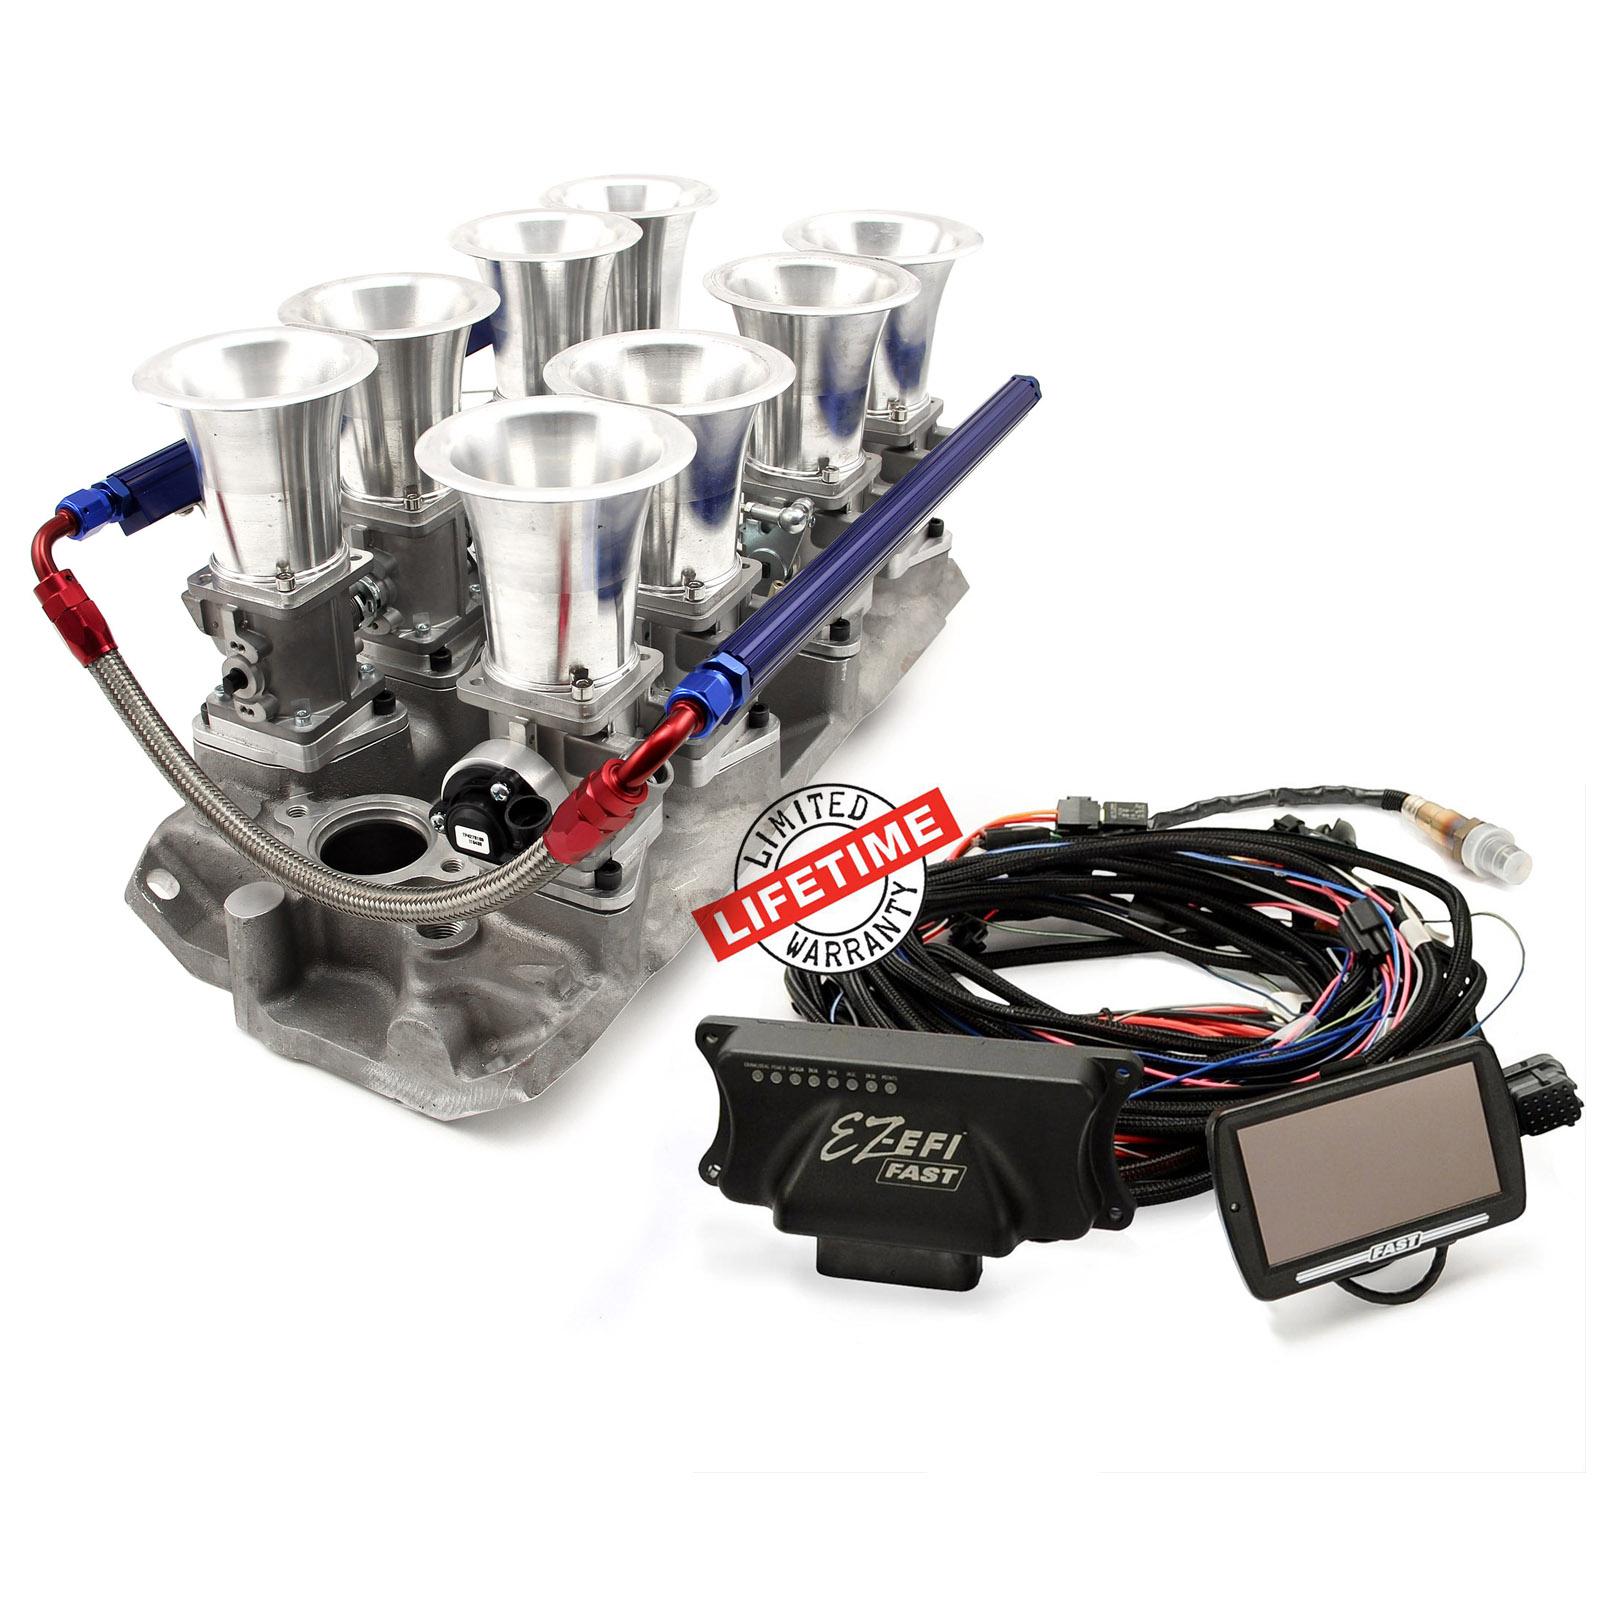 Chevy SBC 350 Manifold & FAST EZ-EFI 2.0 Self-Tuning Fuel